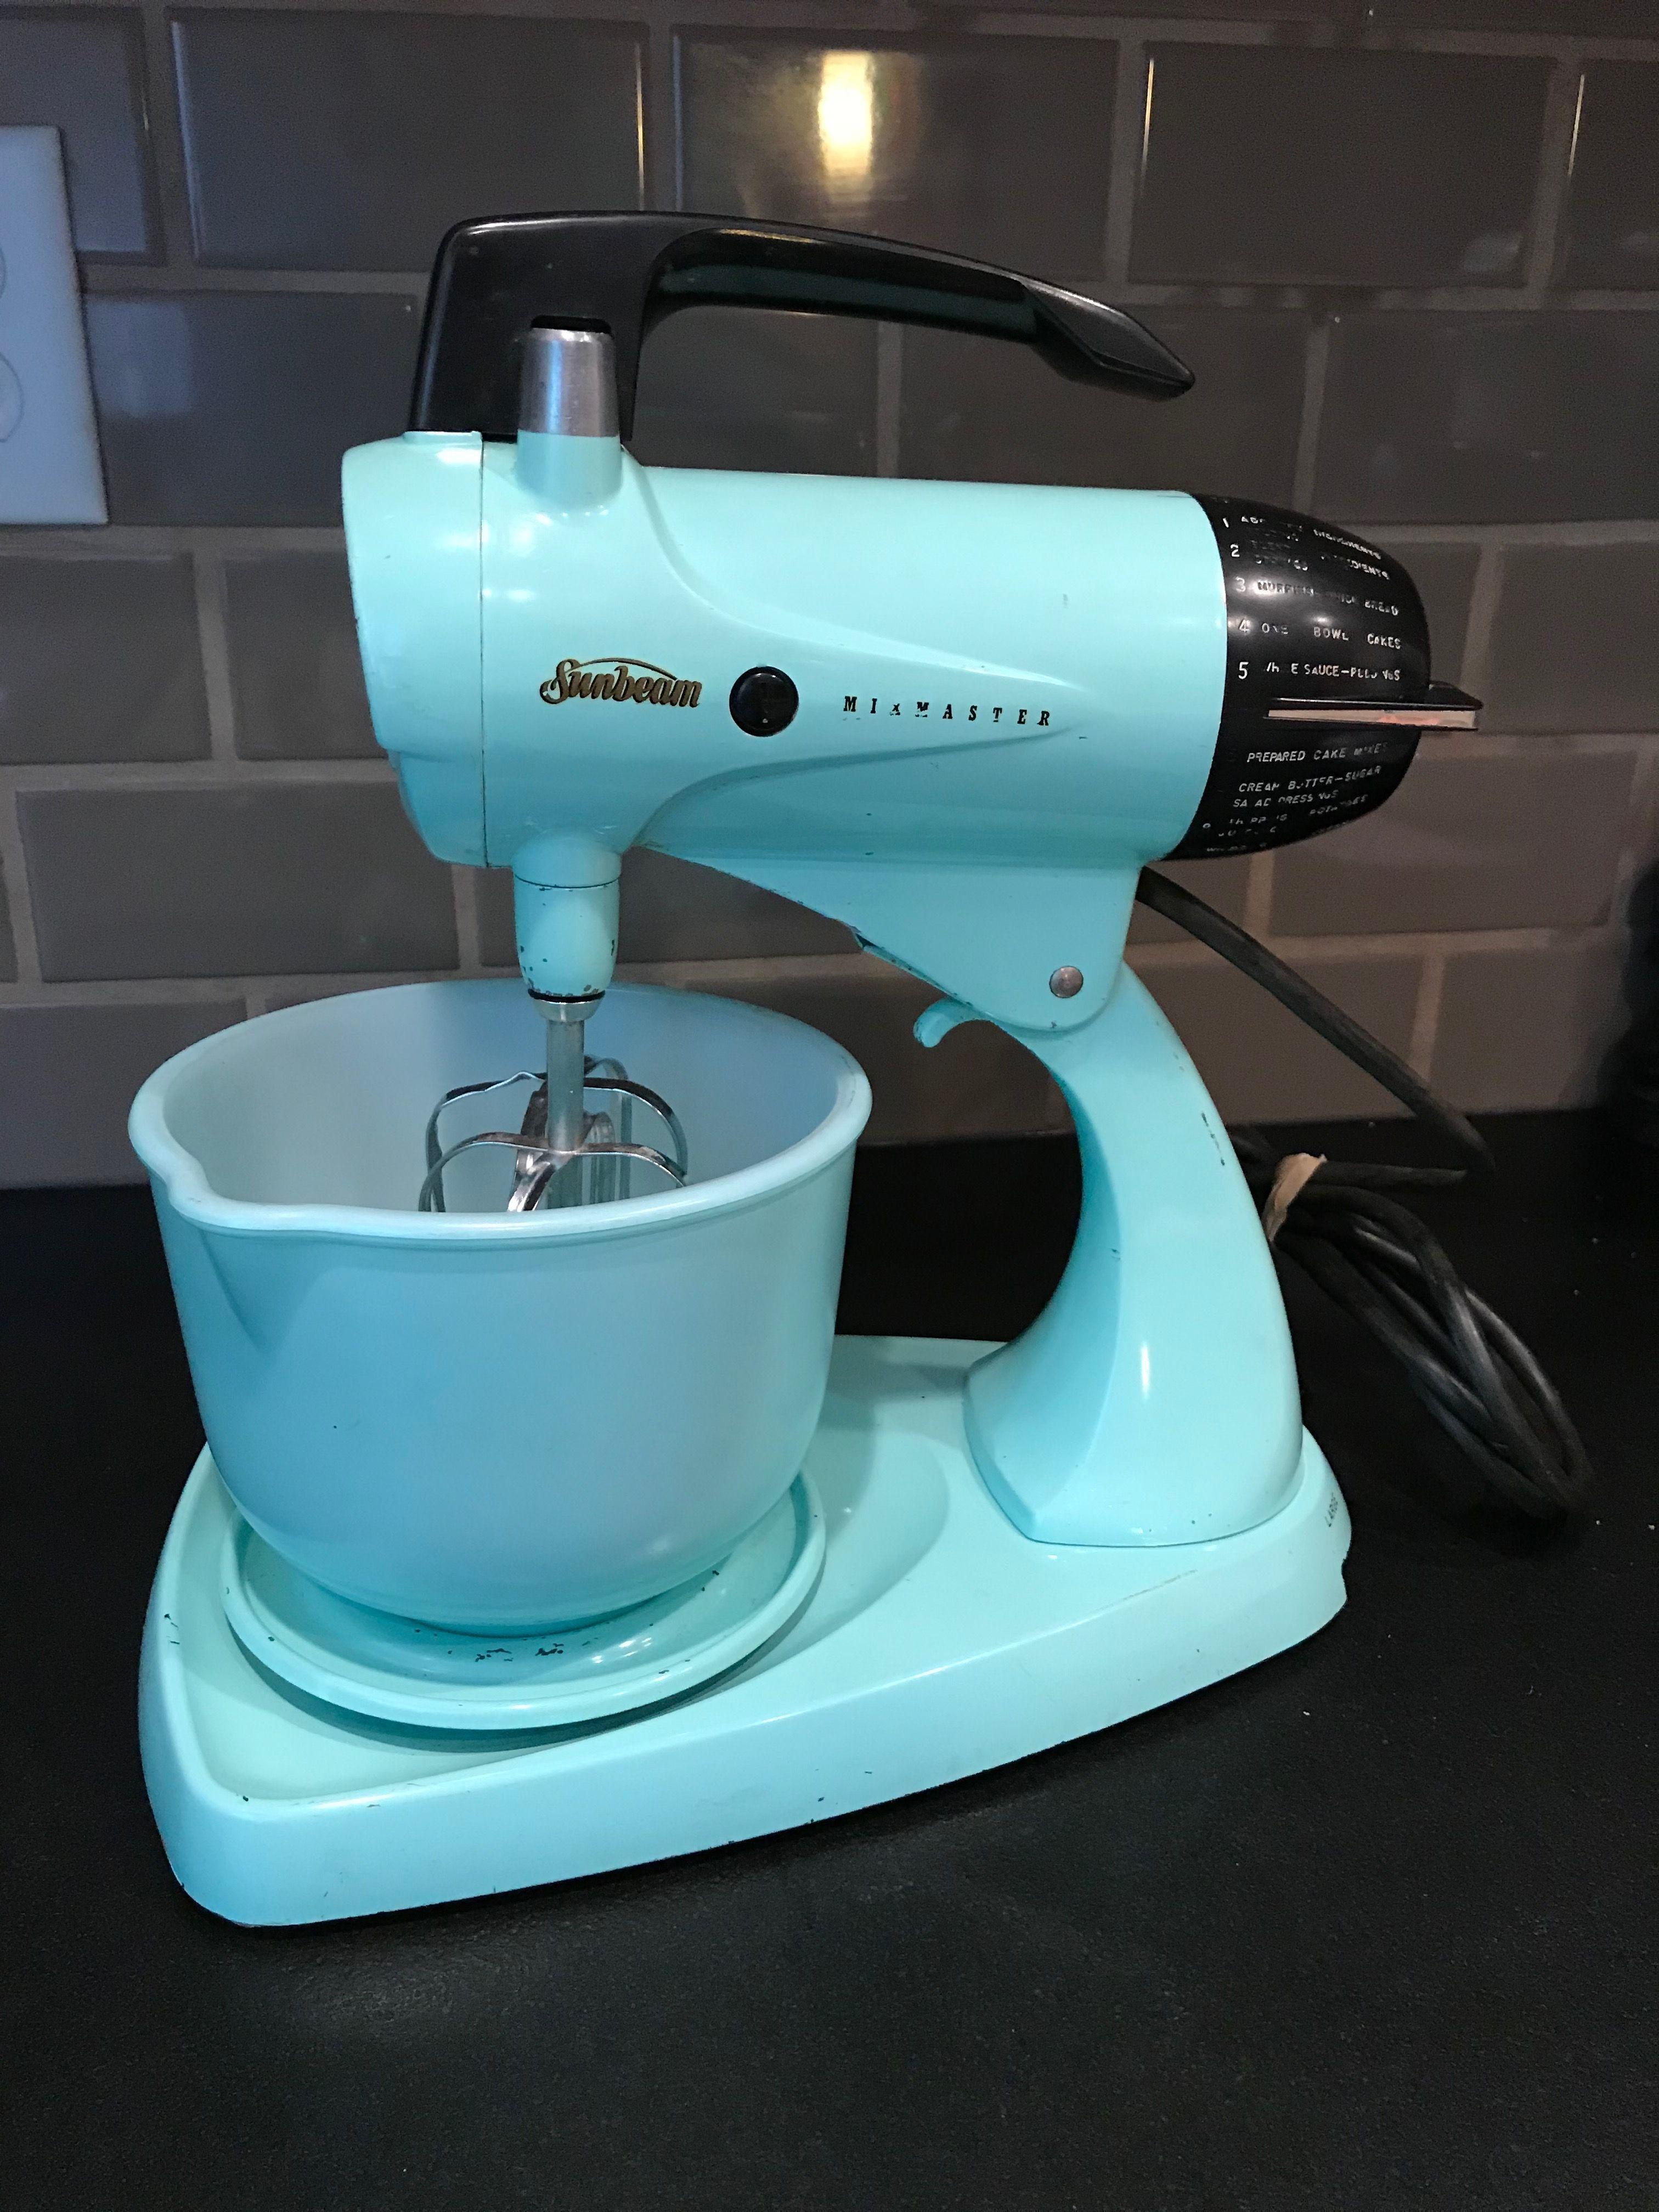 Cool vintage turquoise mixmaster mixer kitchen aid mixer